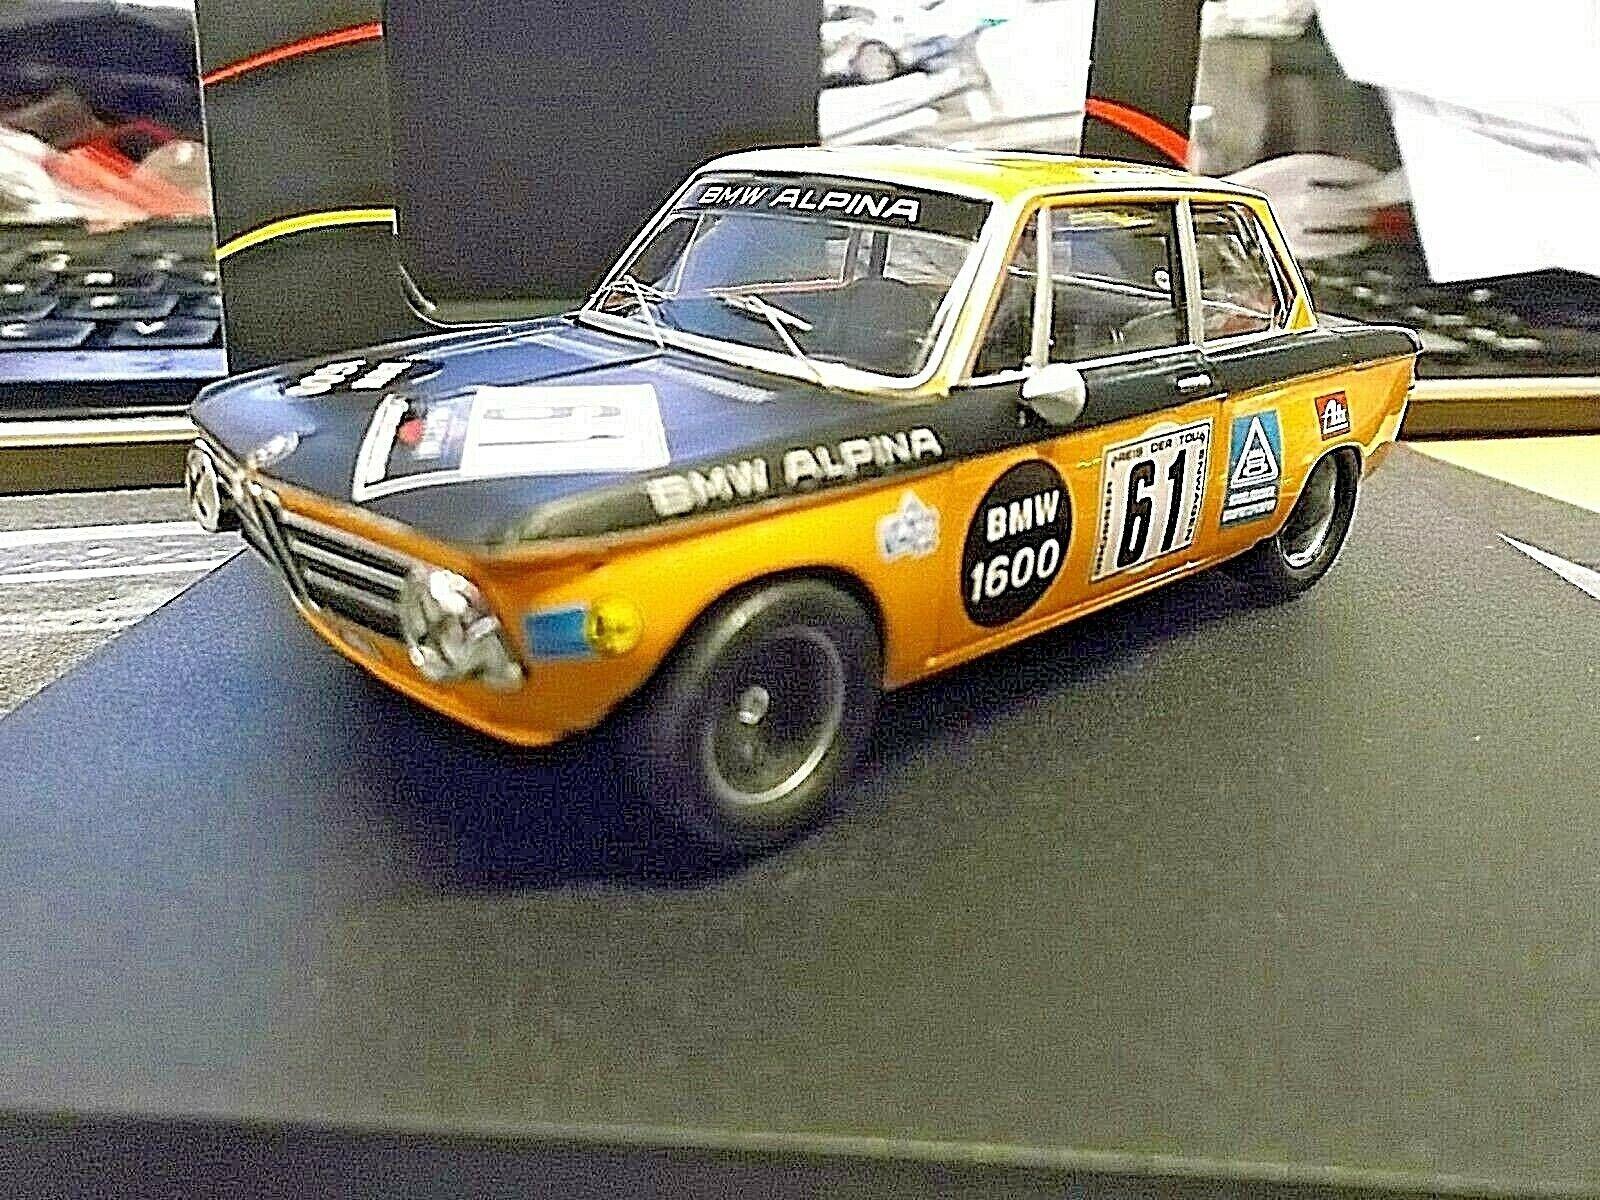 BMW 2002 1600  61 Alpina Tuning DRM Nurburgring Lauda  61 1970 Trofeu 1 43